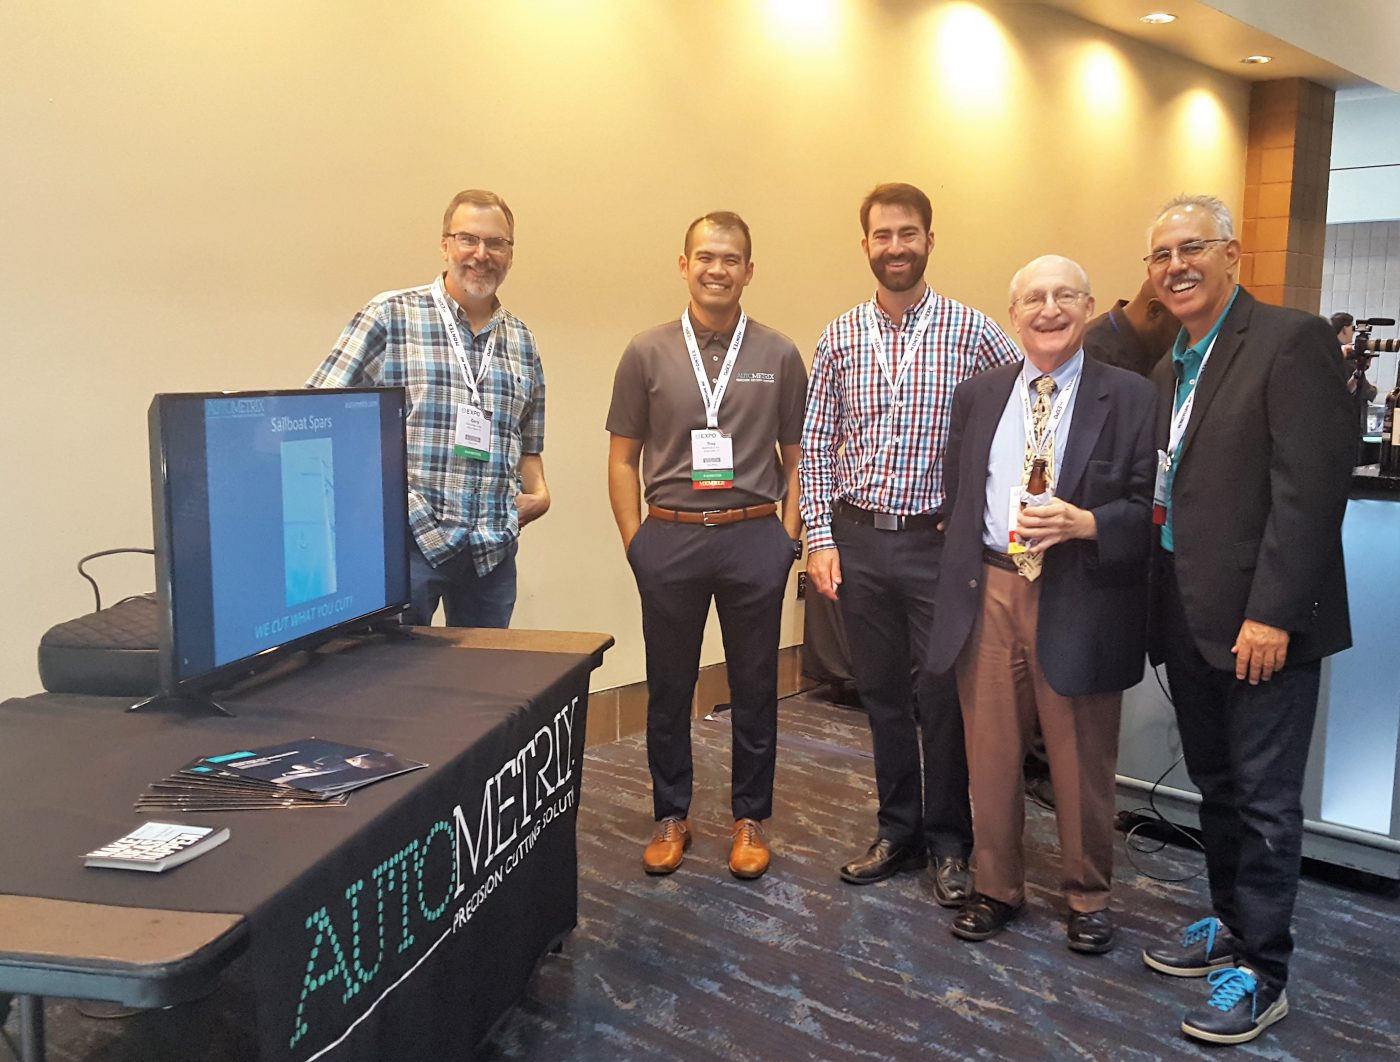 Autometrix-Midwest Fabric Association Conference